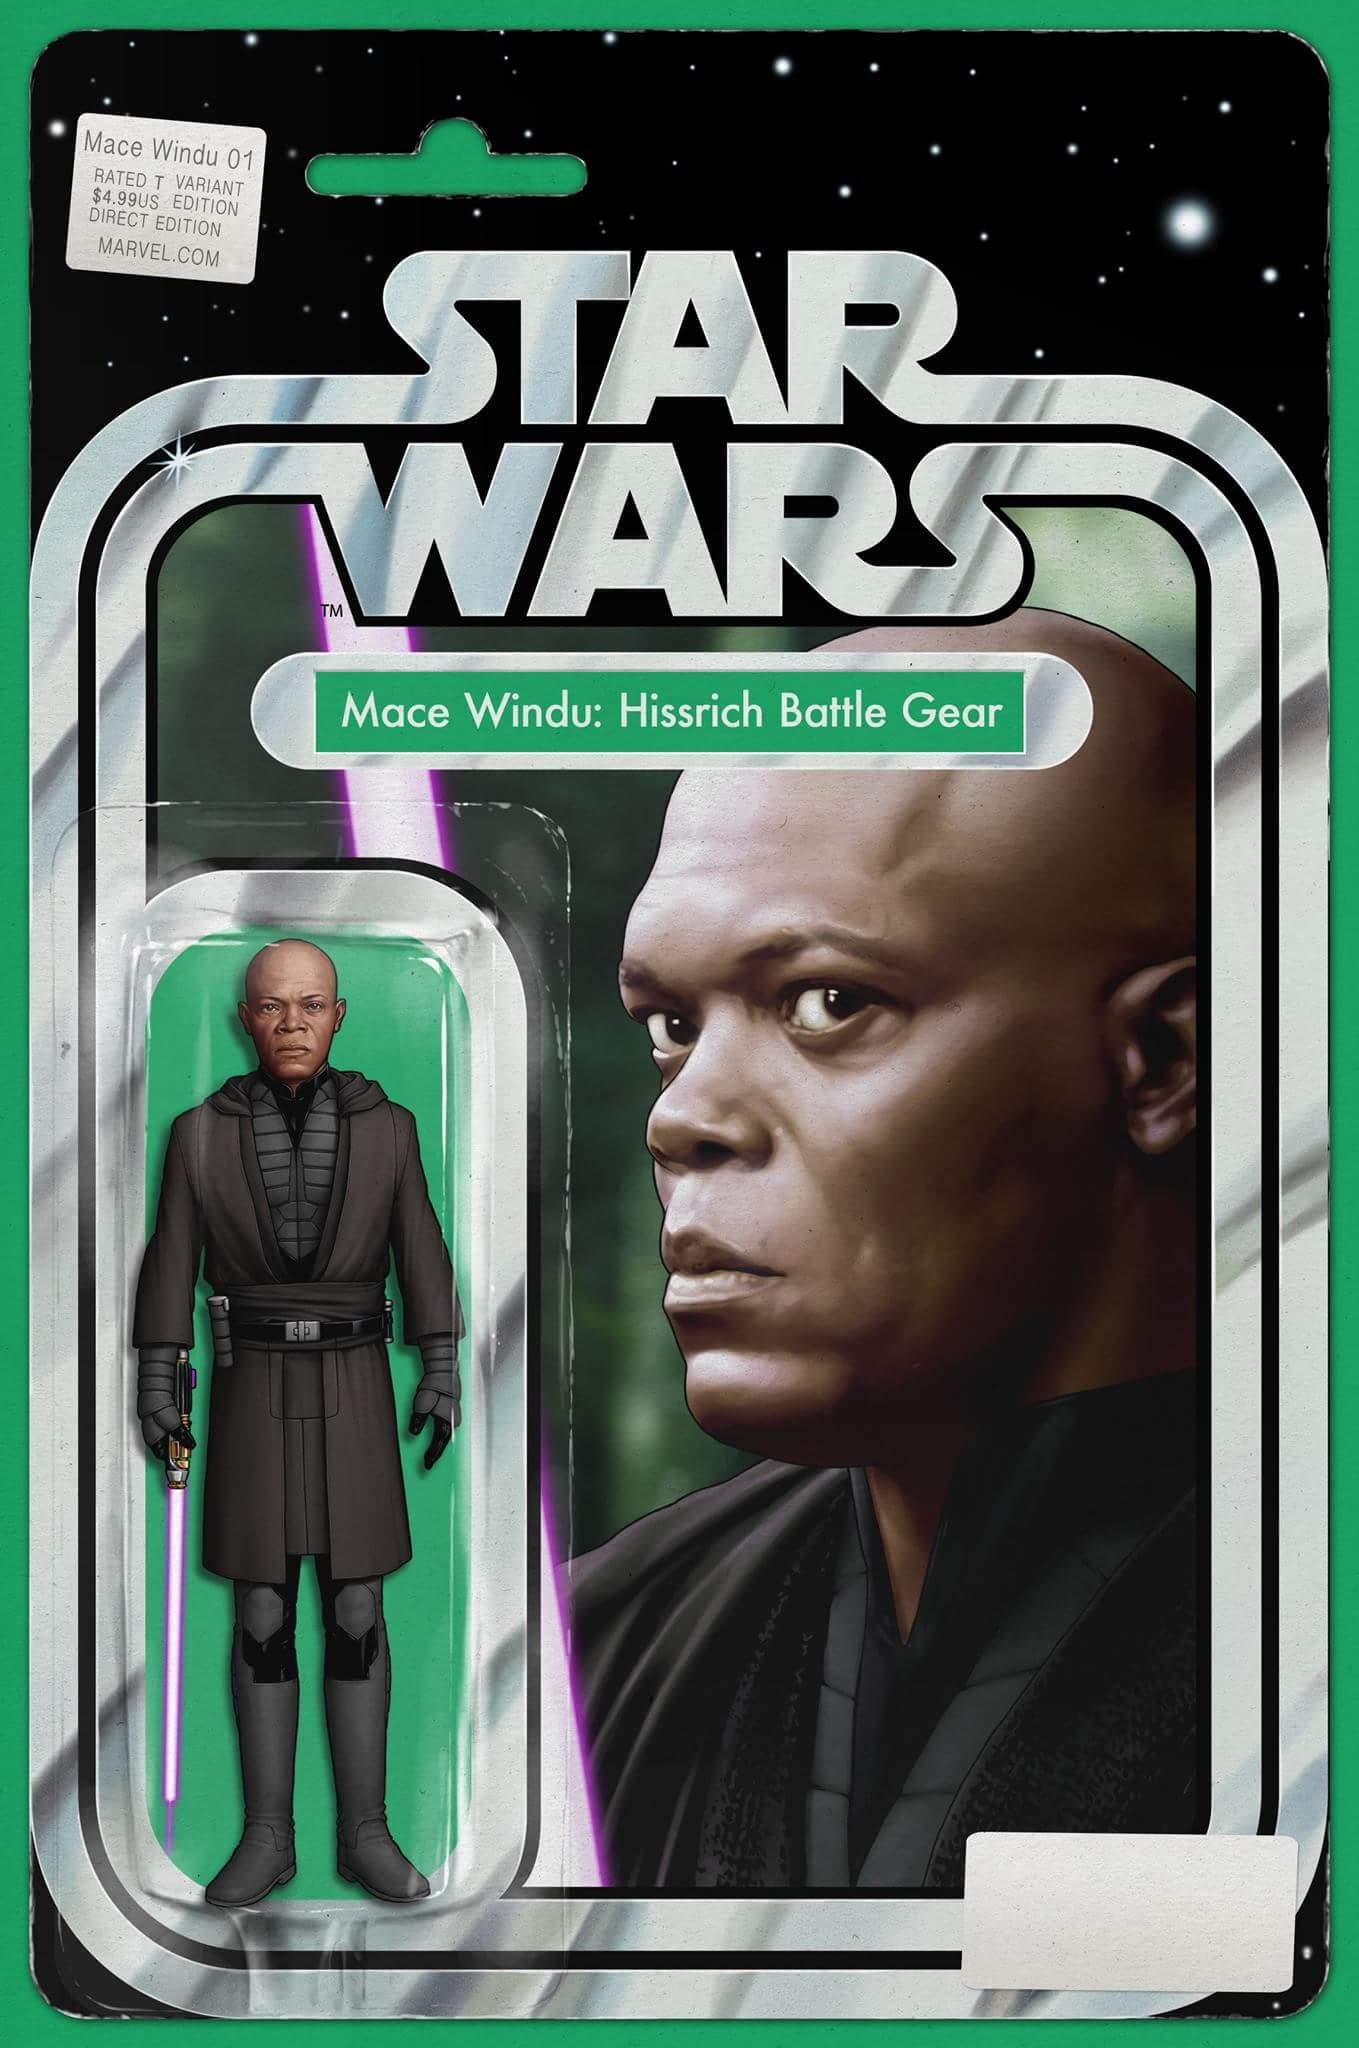 Jedi of the Republic - Mace Windu #1 (Action Figure Variant Cover) (23.08.2017)